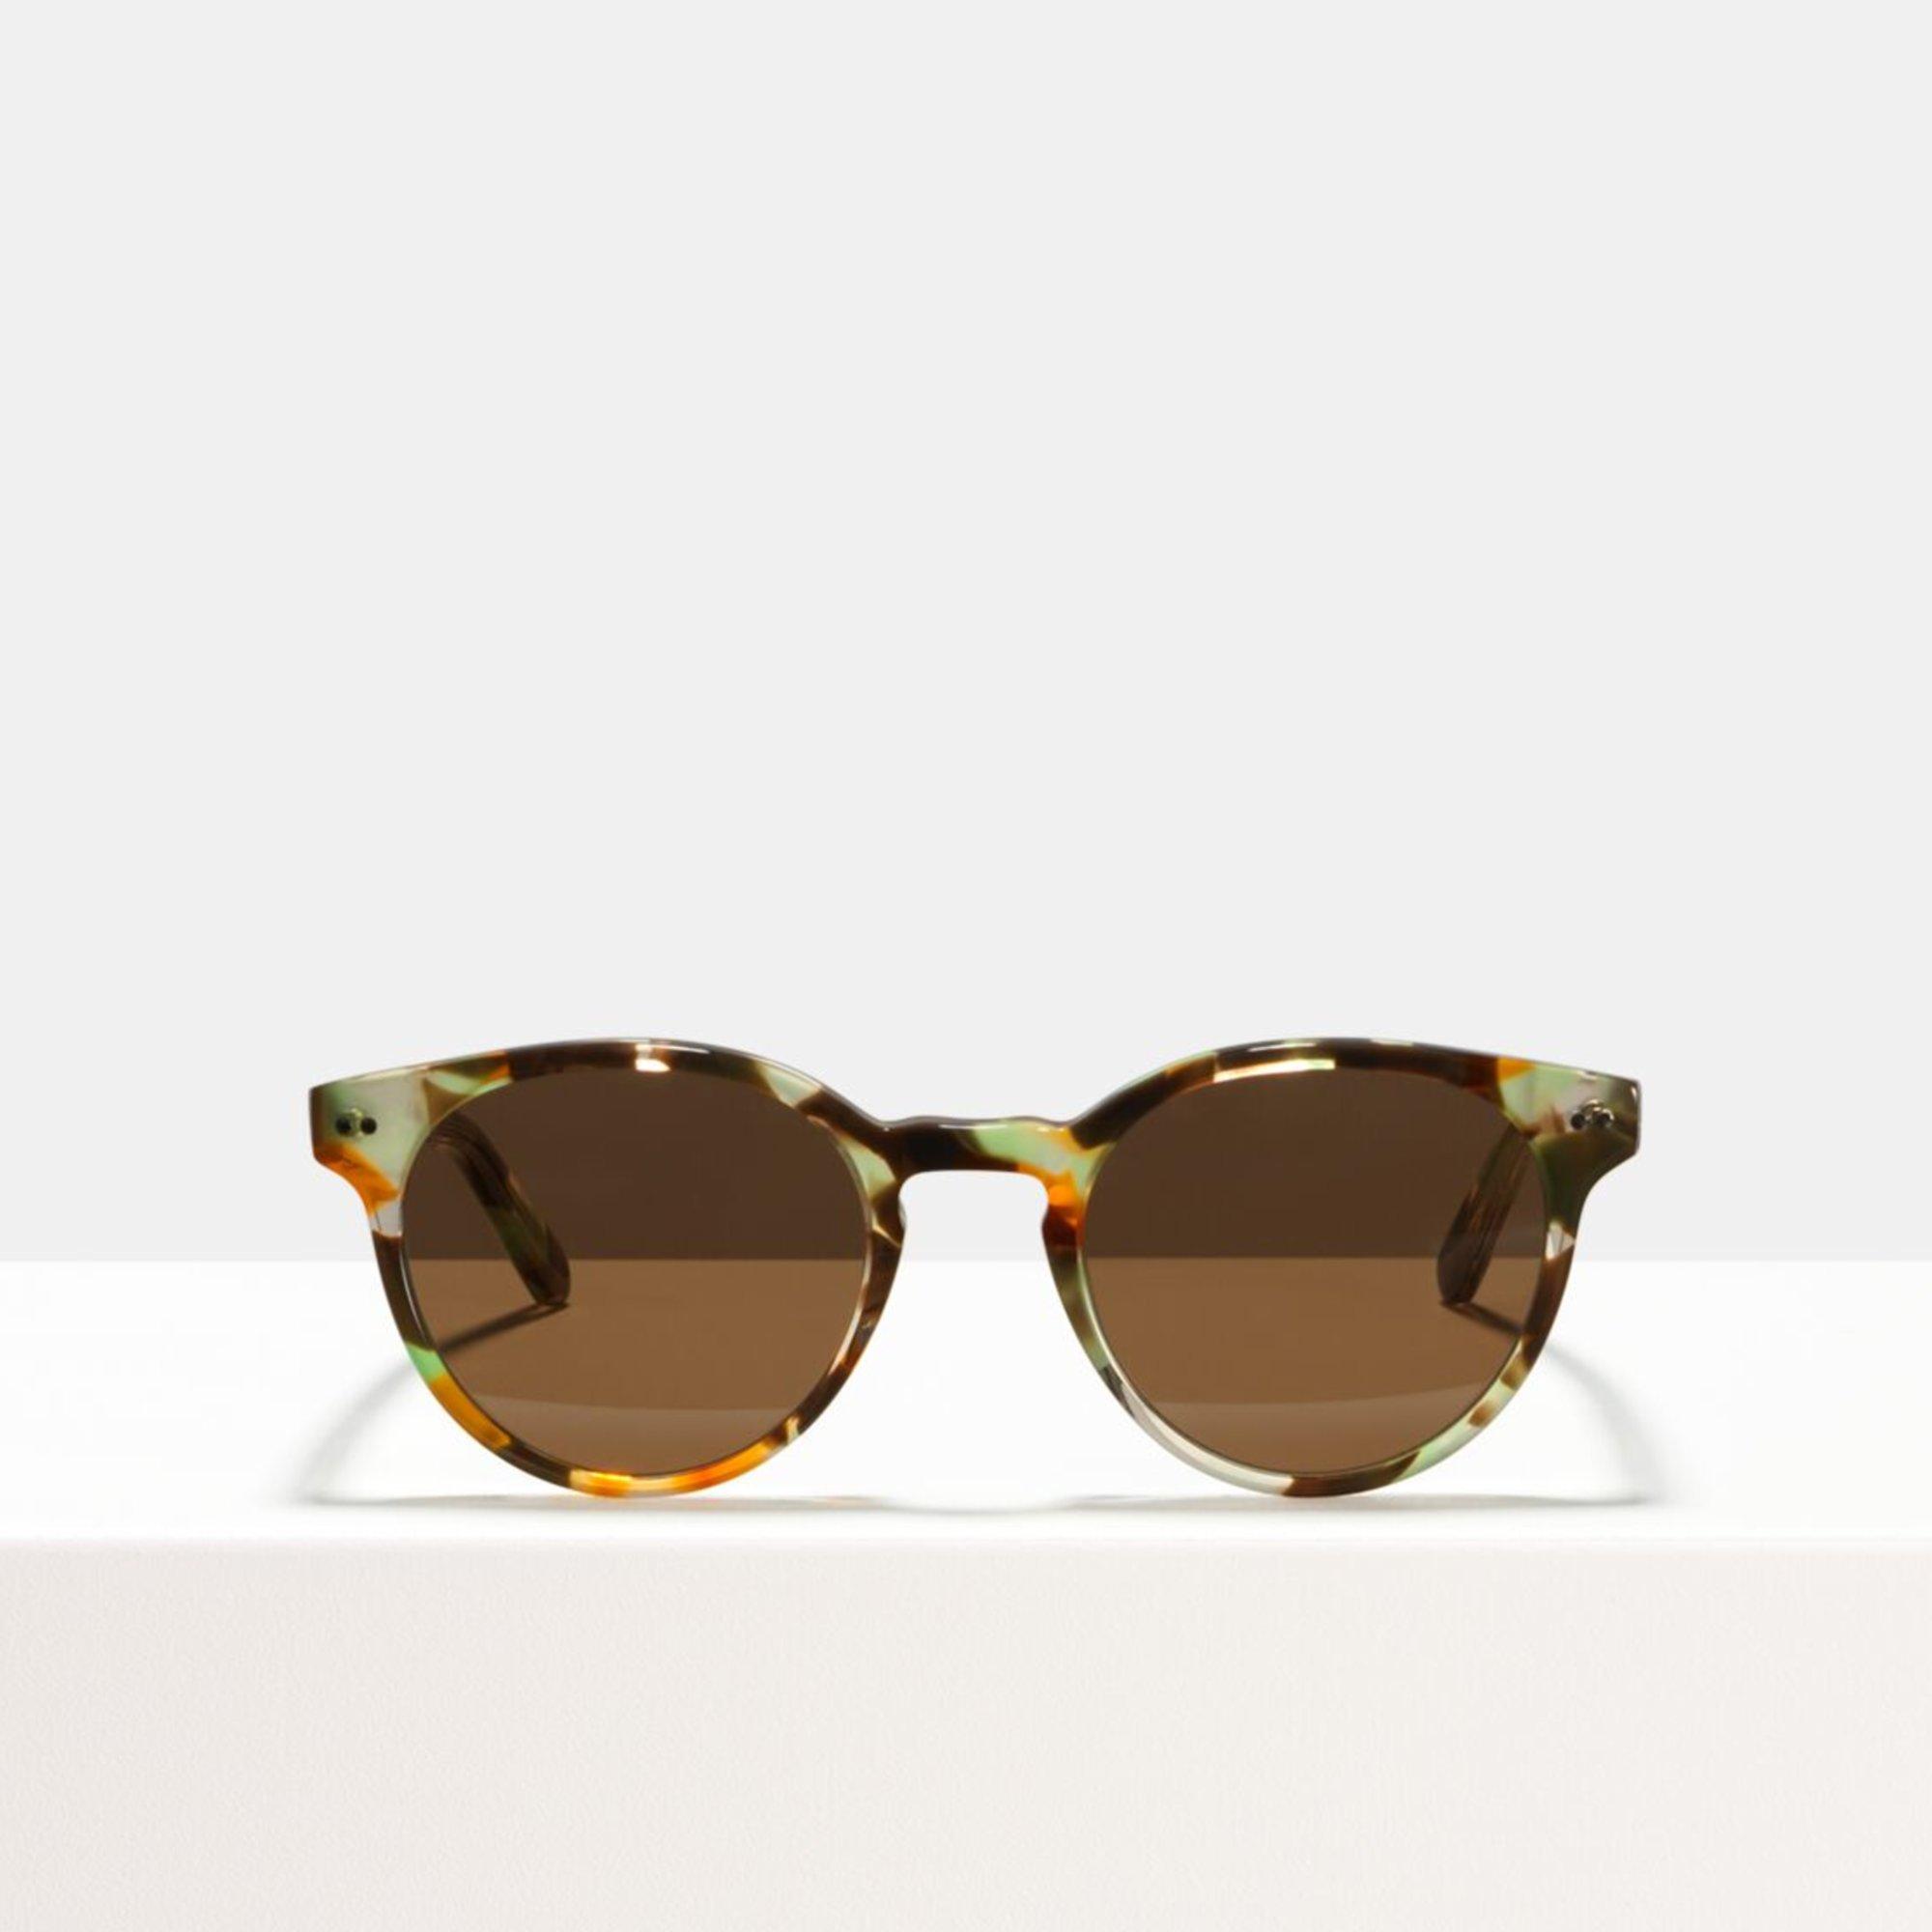 Ace & Tate Sunglasses   round acetate in Brown, Green, multicolor, Orange, Yellow